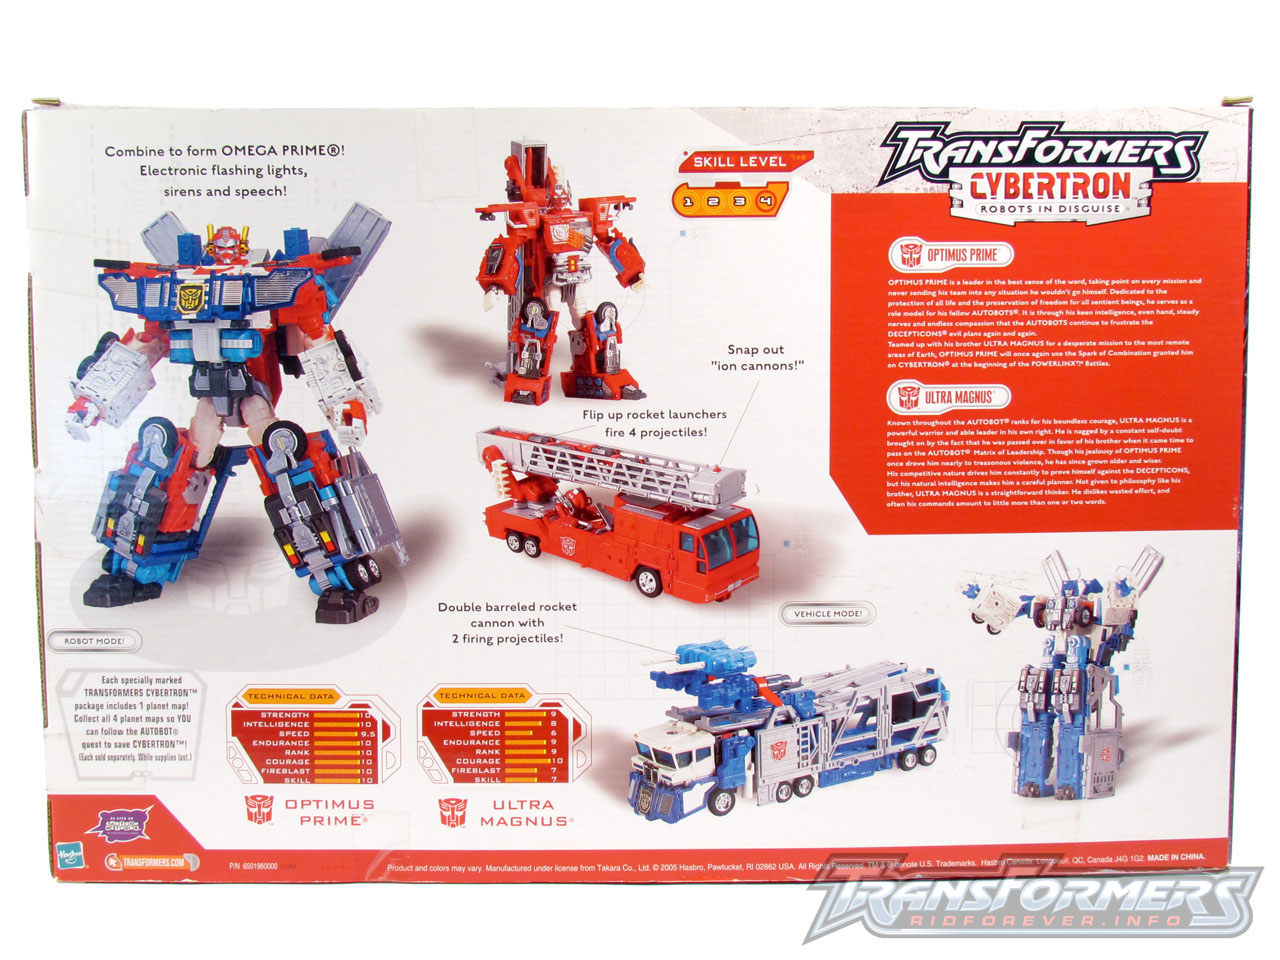 Cybertron Omega Prime 004